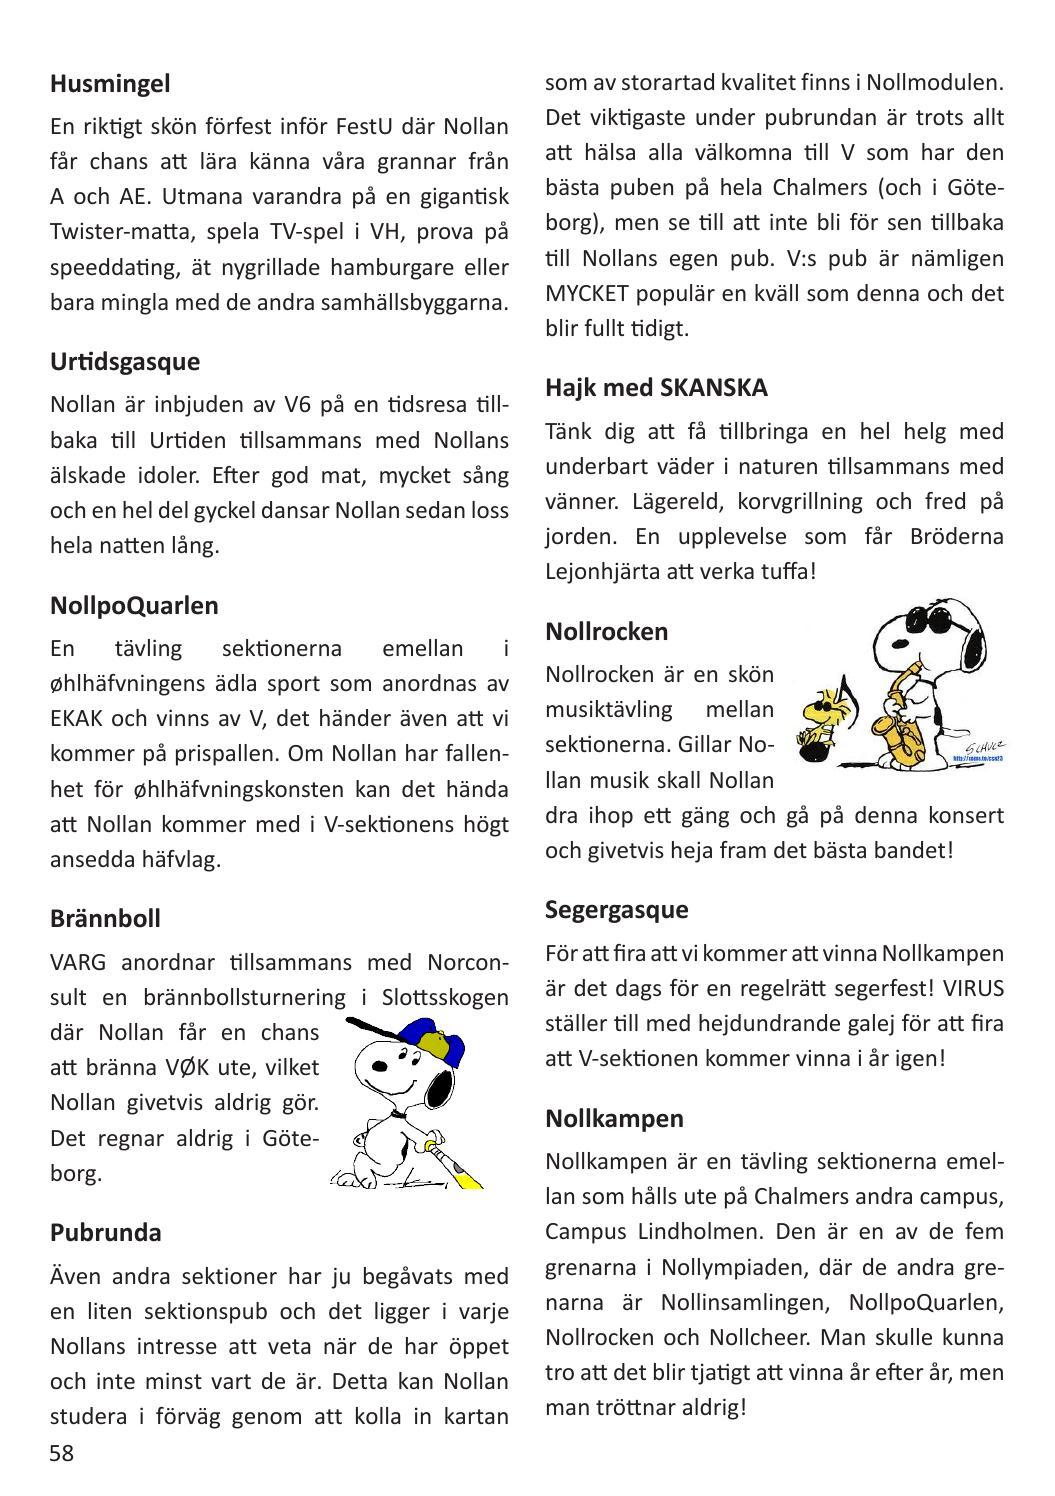 Kalender - Om universitetet, Gteborgs universitet